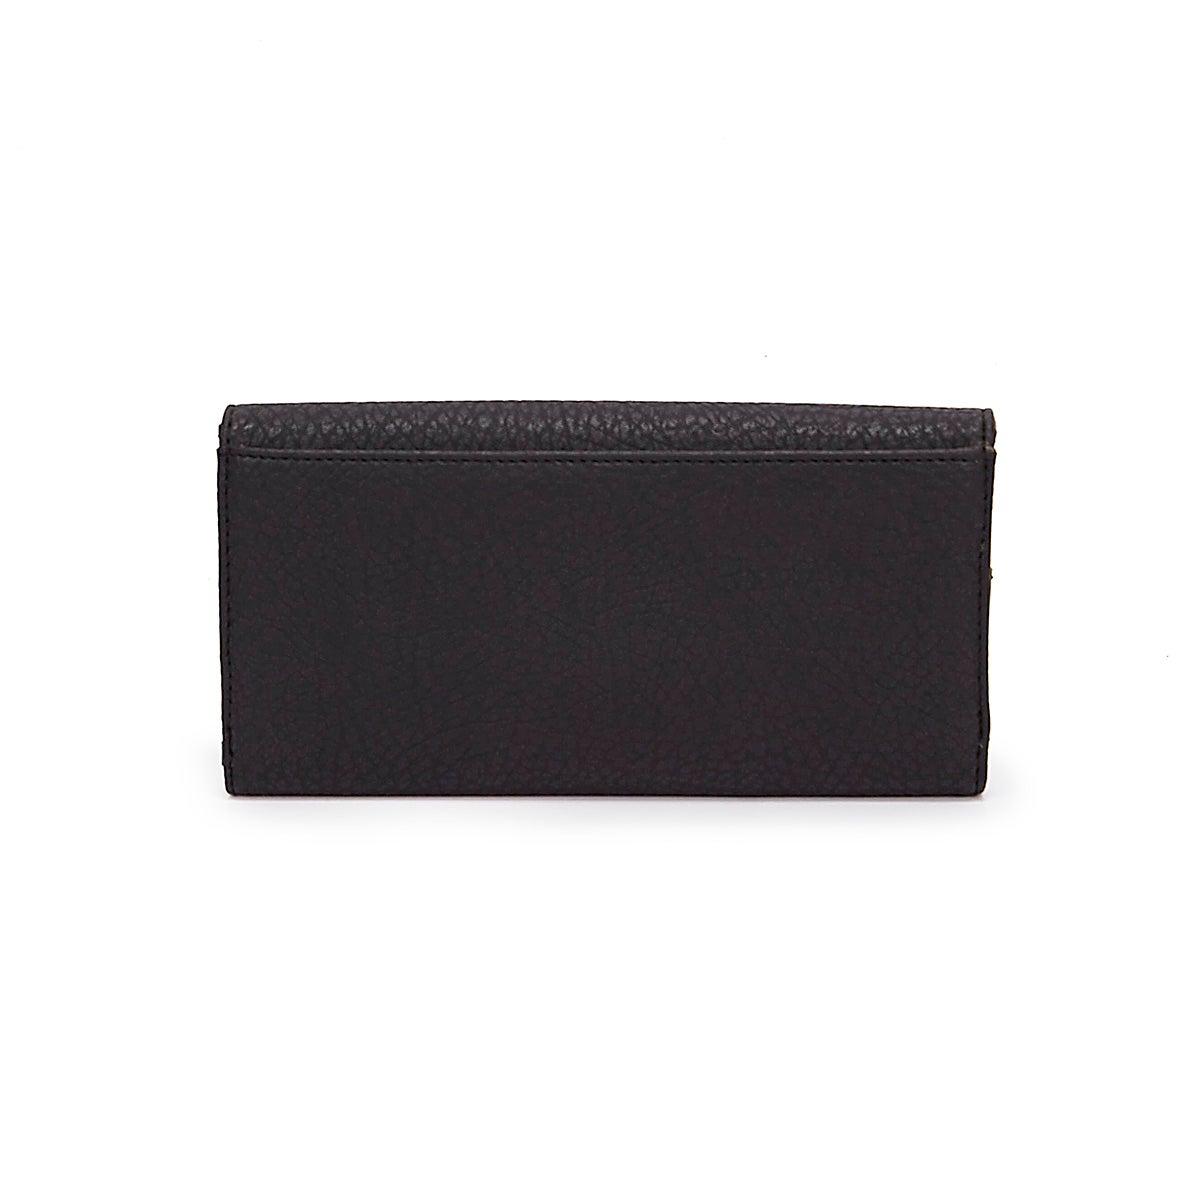 Lds Midnight black large wallet